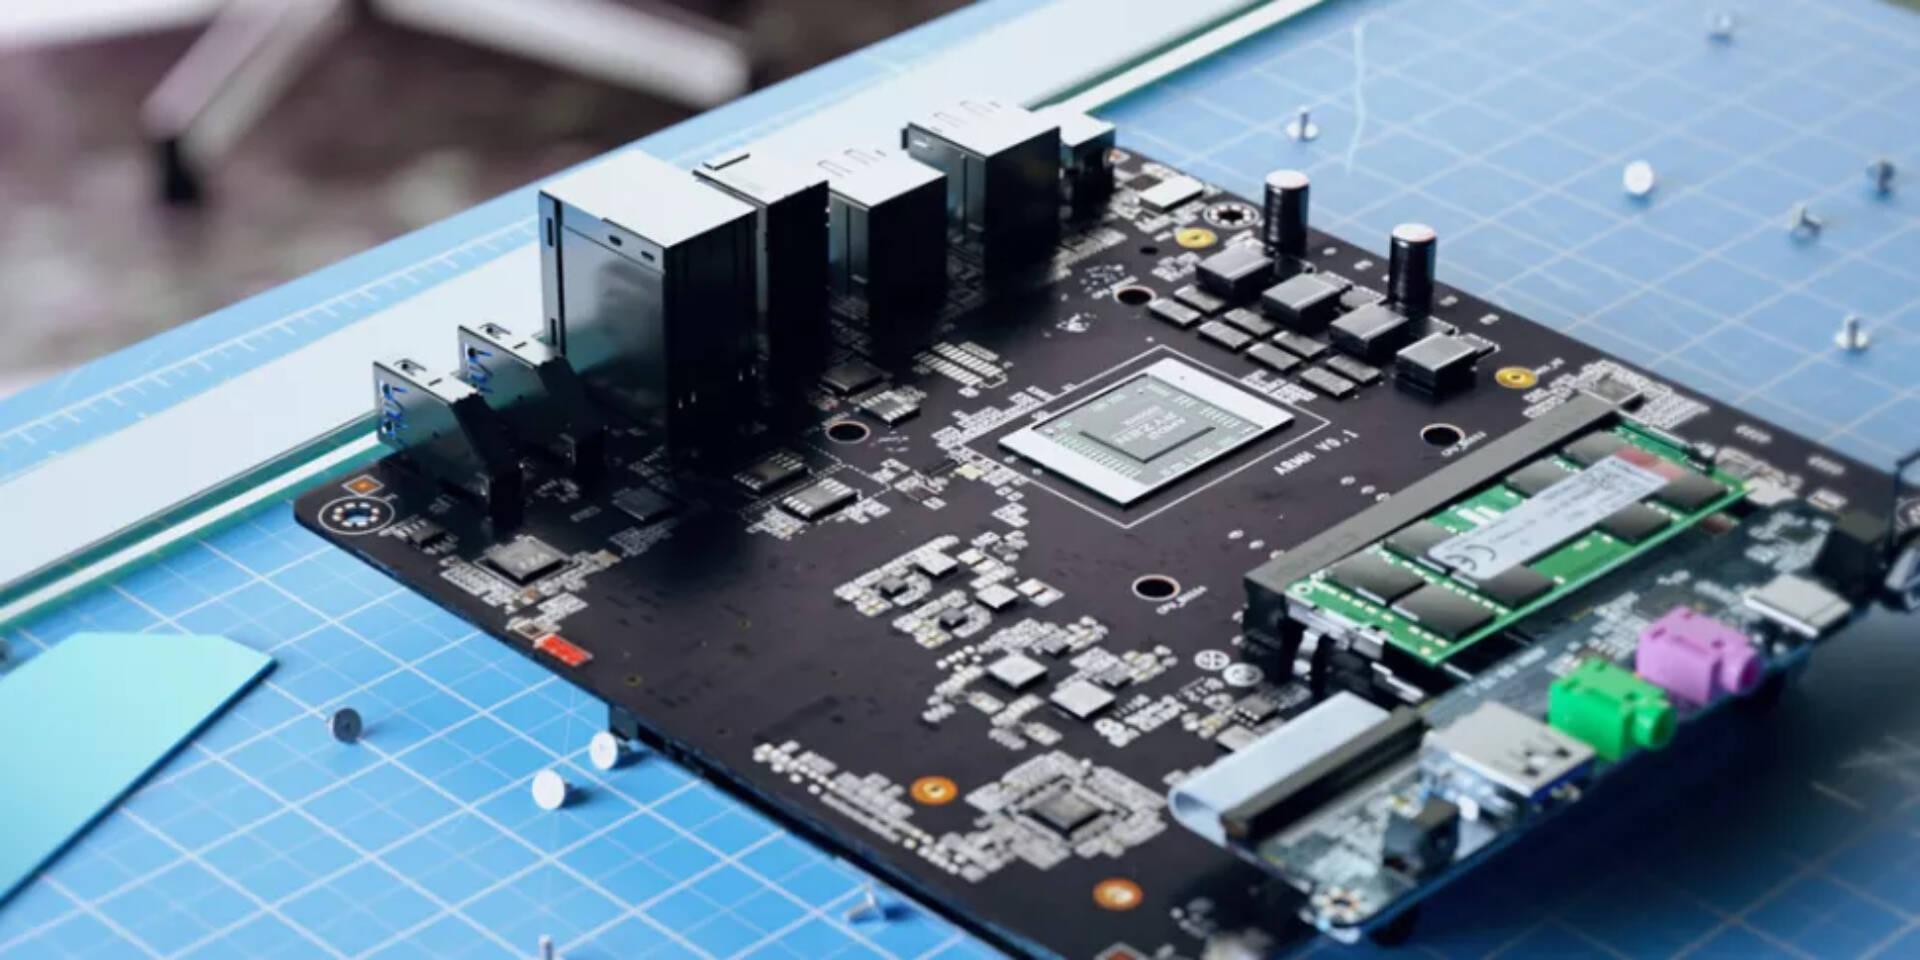 Minisforum AMD Ryzen 5900HX